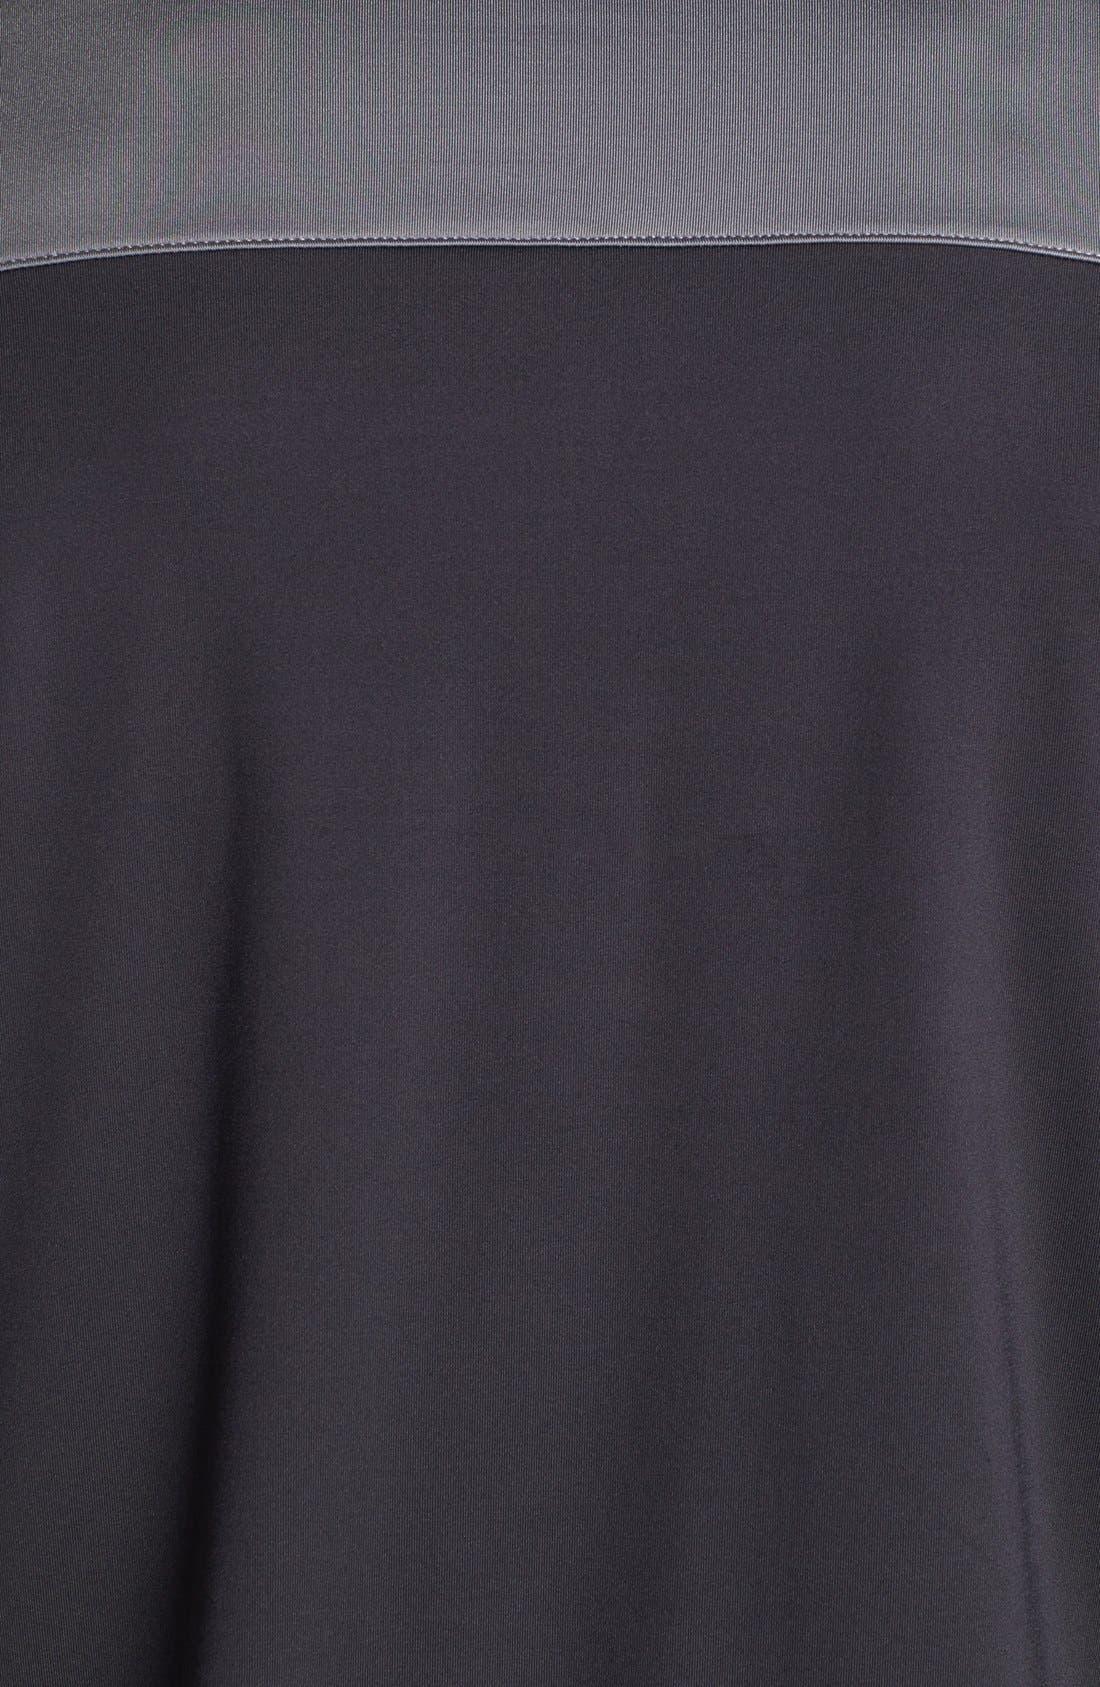 Alternate Image 3  - Travis Mathew 'Jefferys' Jacket